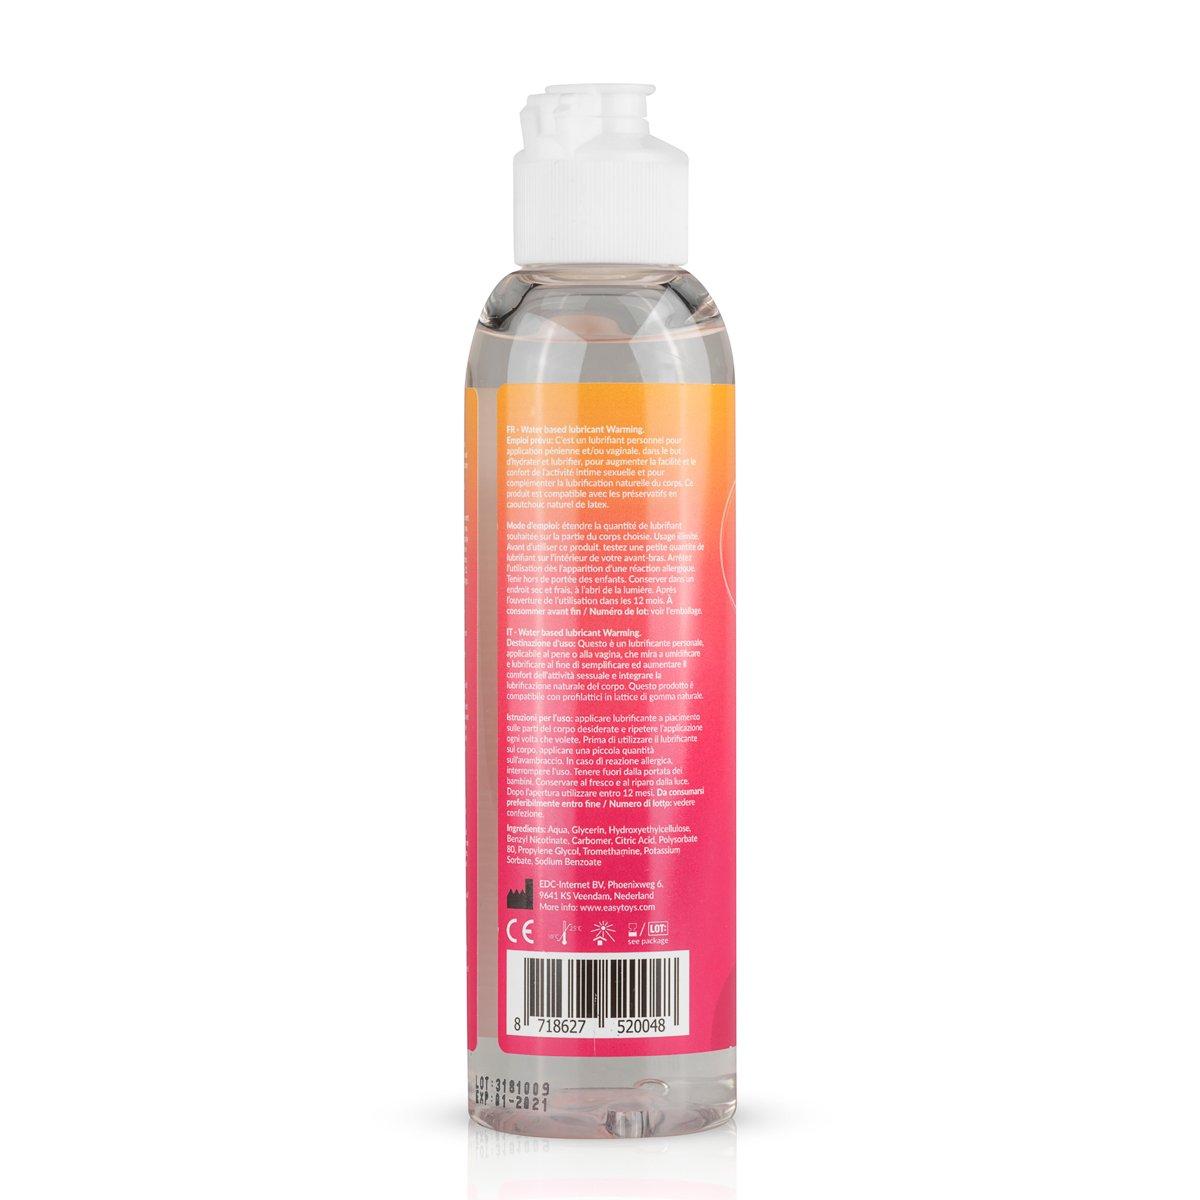 01cd1bab0 EasyGlide Water Based Lubricant